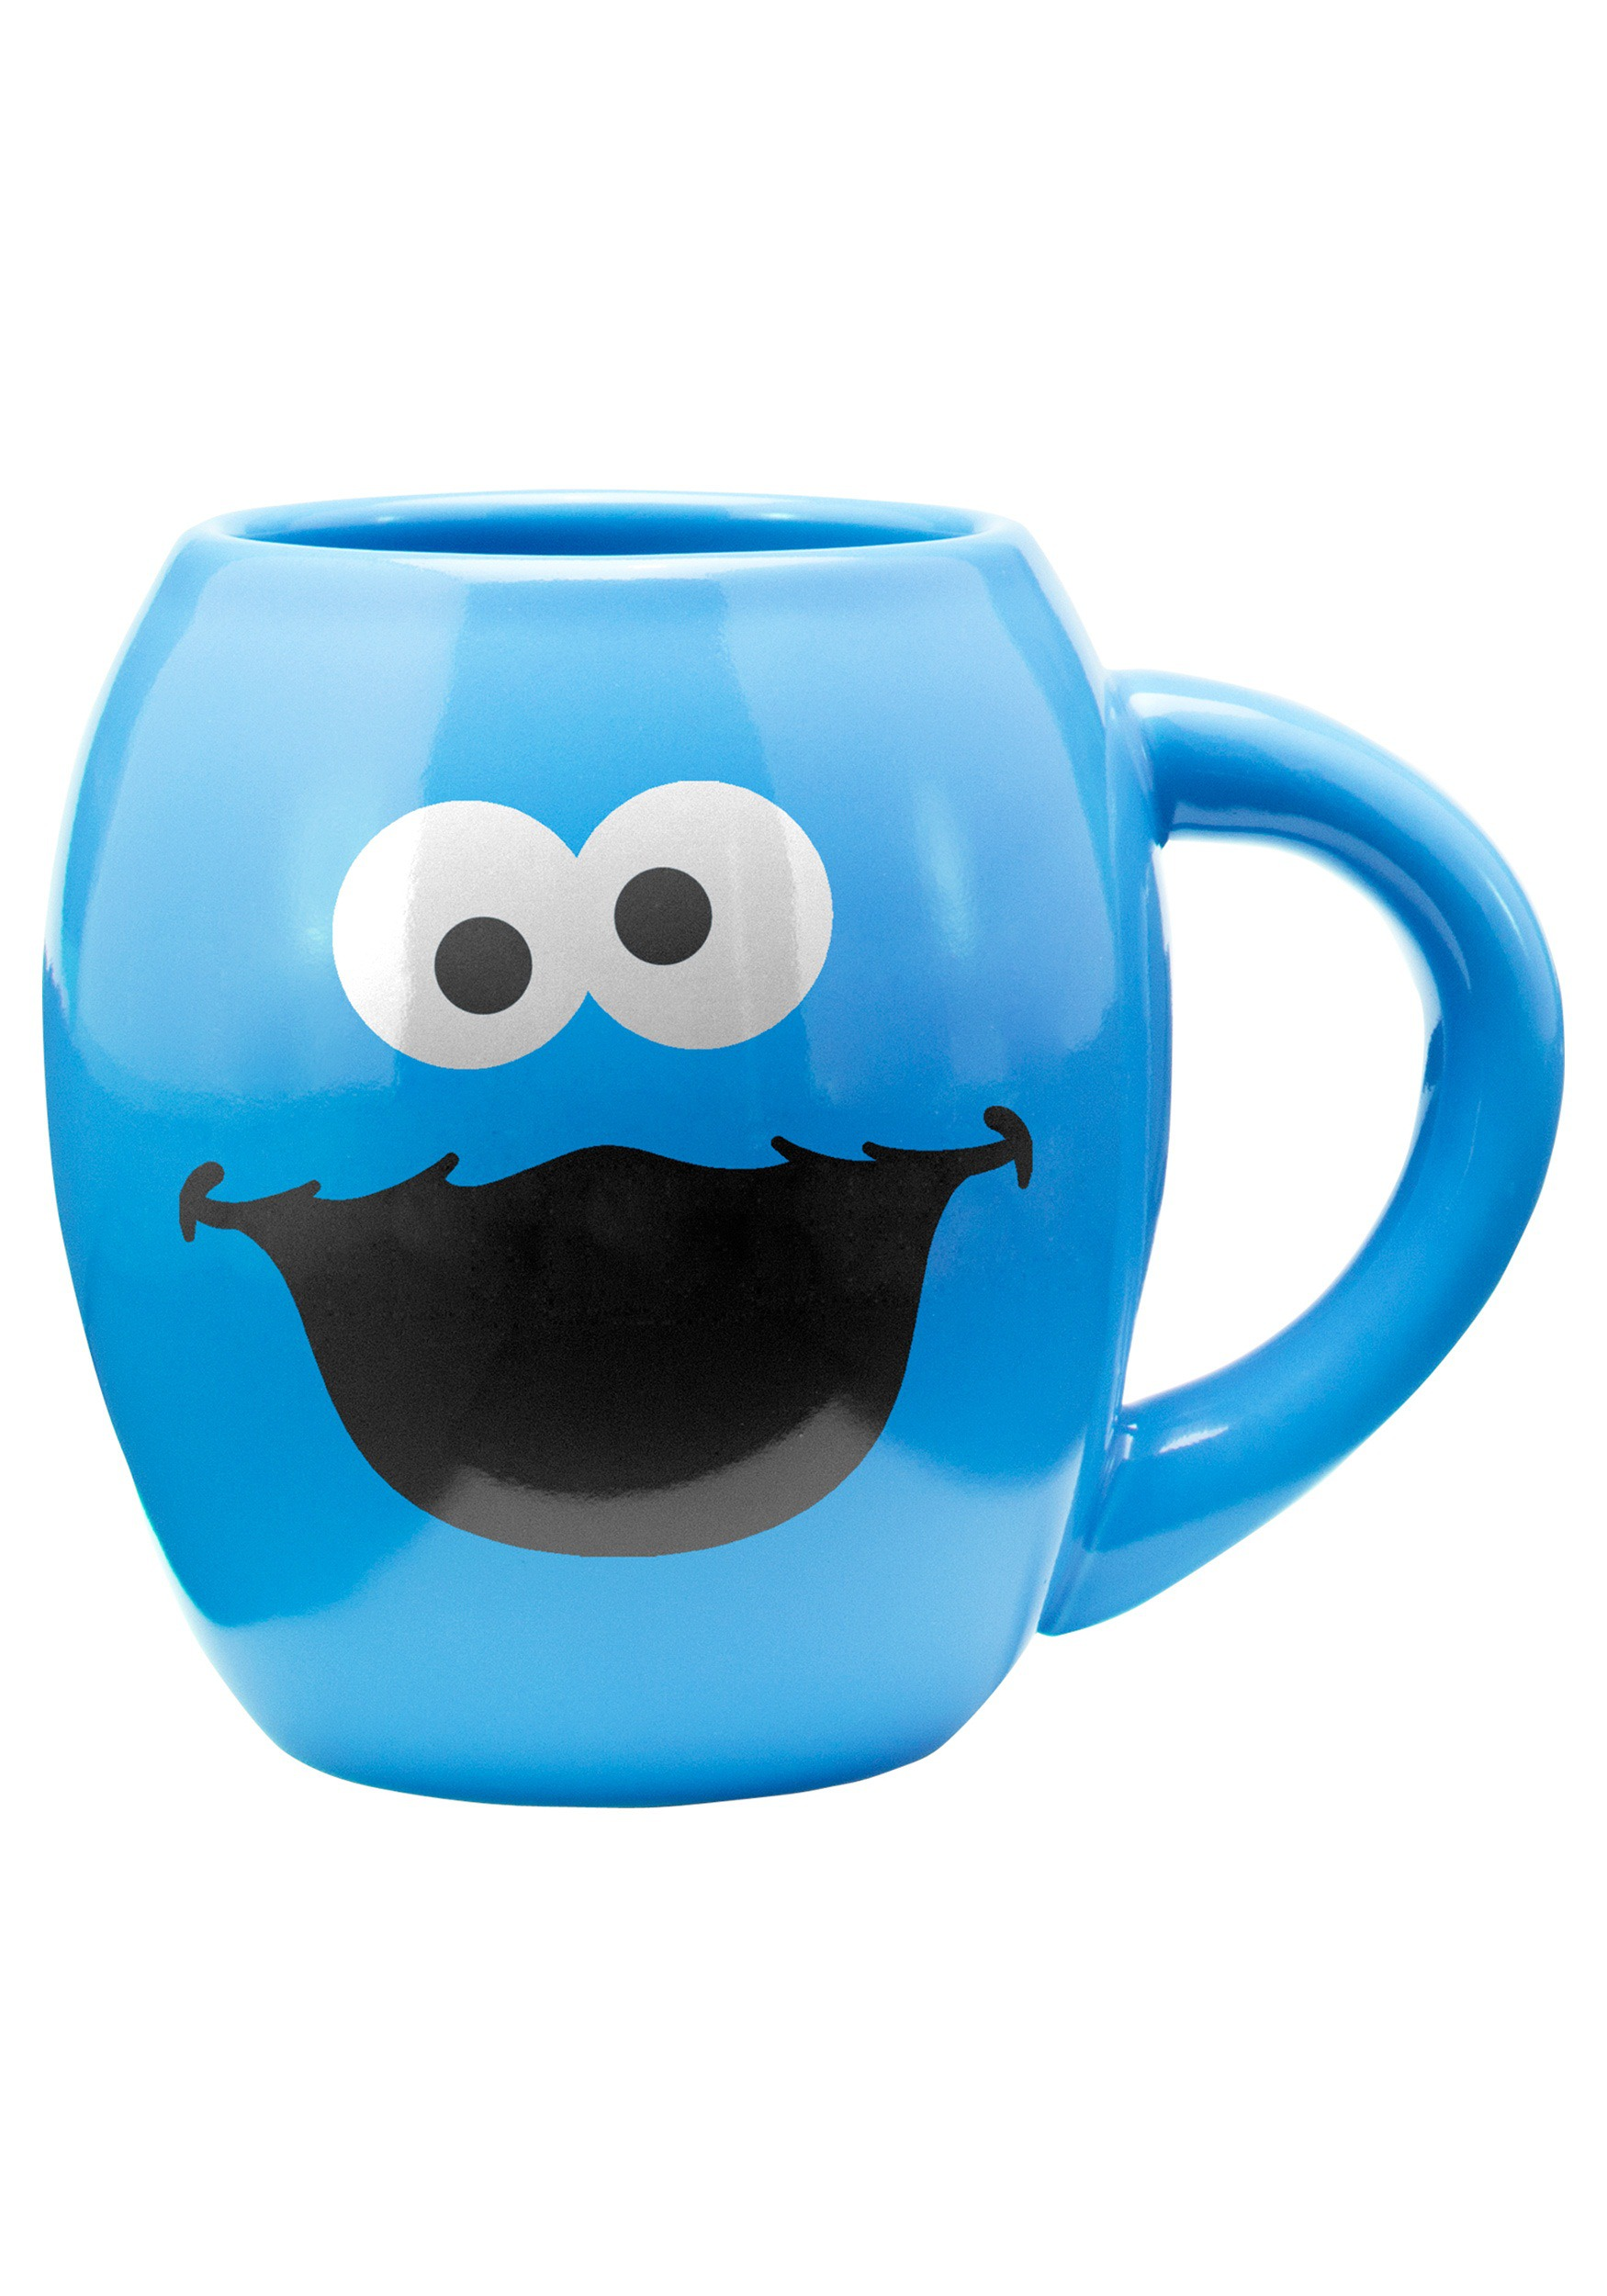 0a06f6d6b2 sesame-street-cookie-monster-mug.jpg